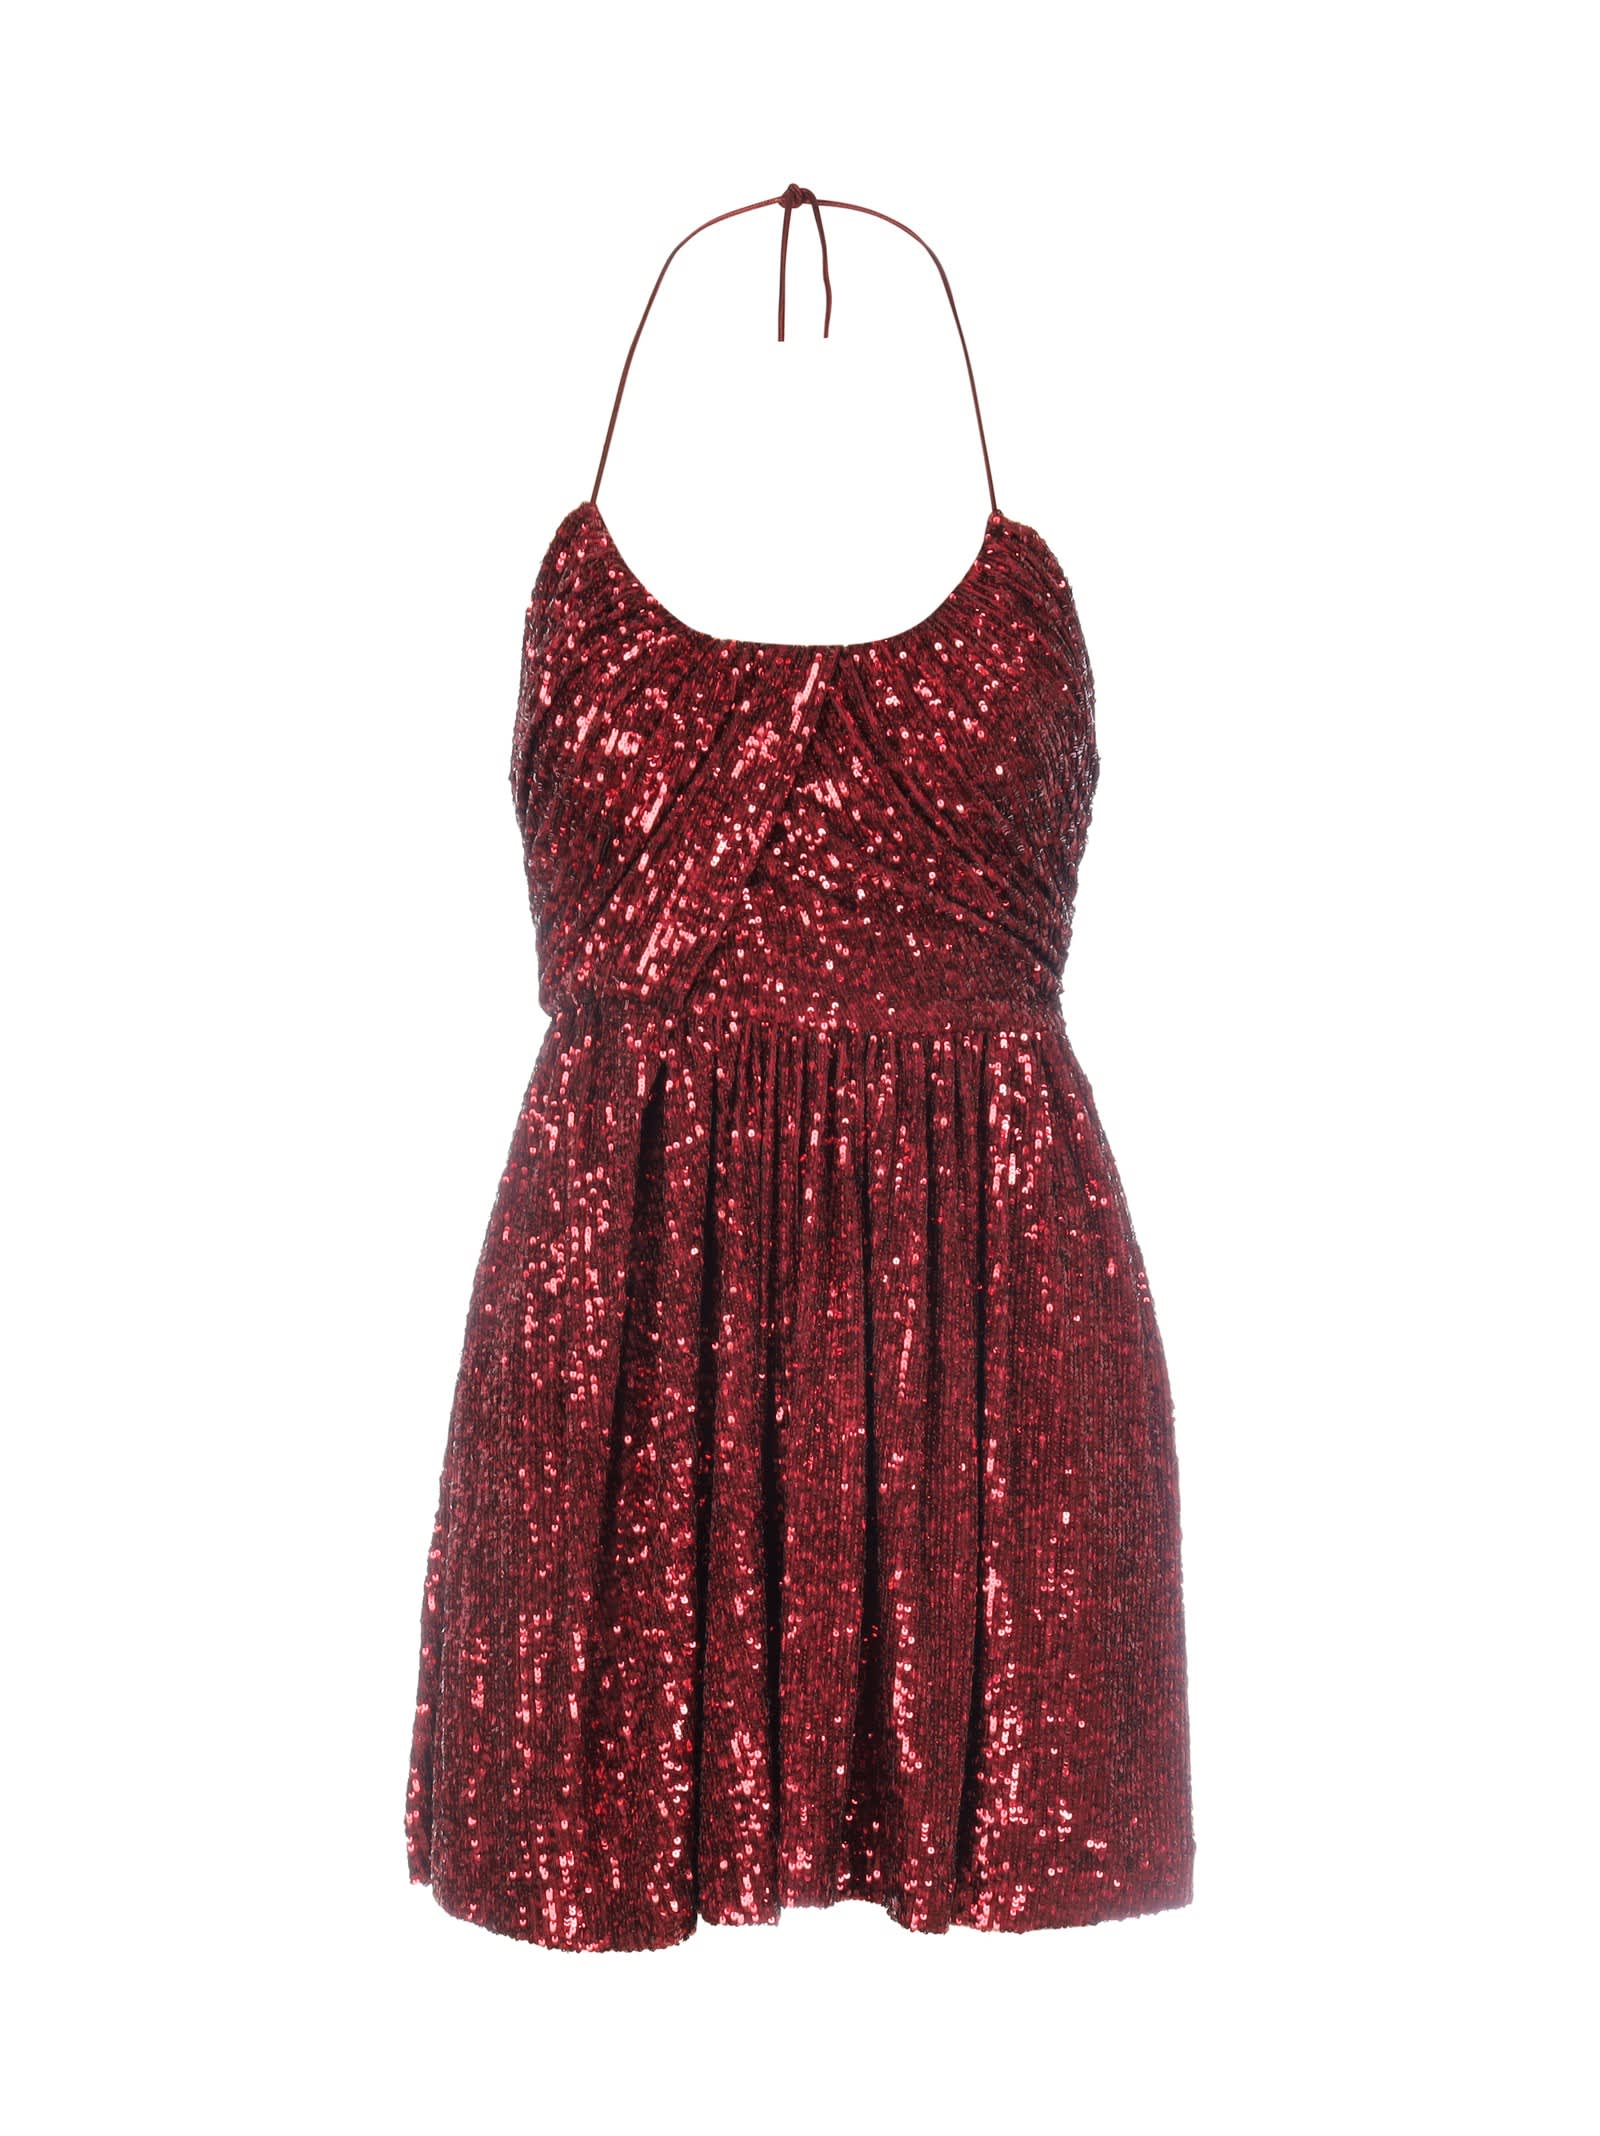 Saint Laurent Draped Dress